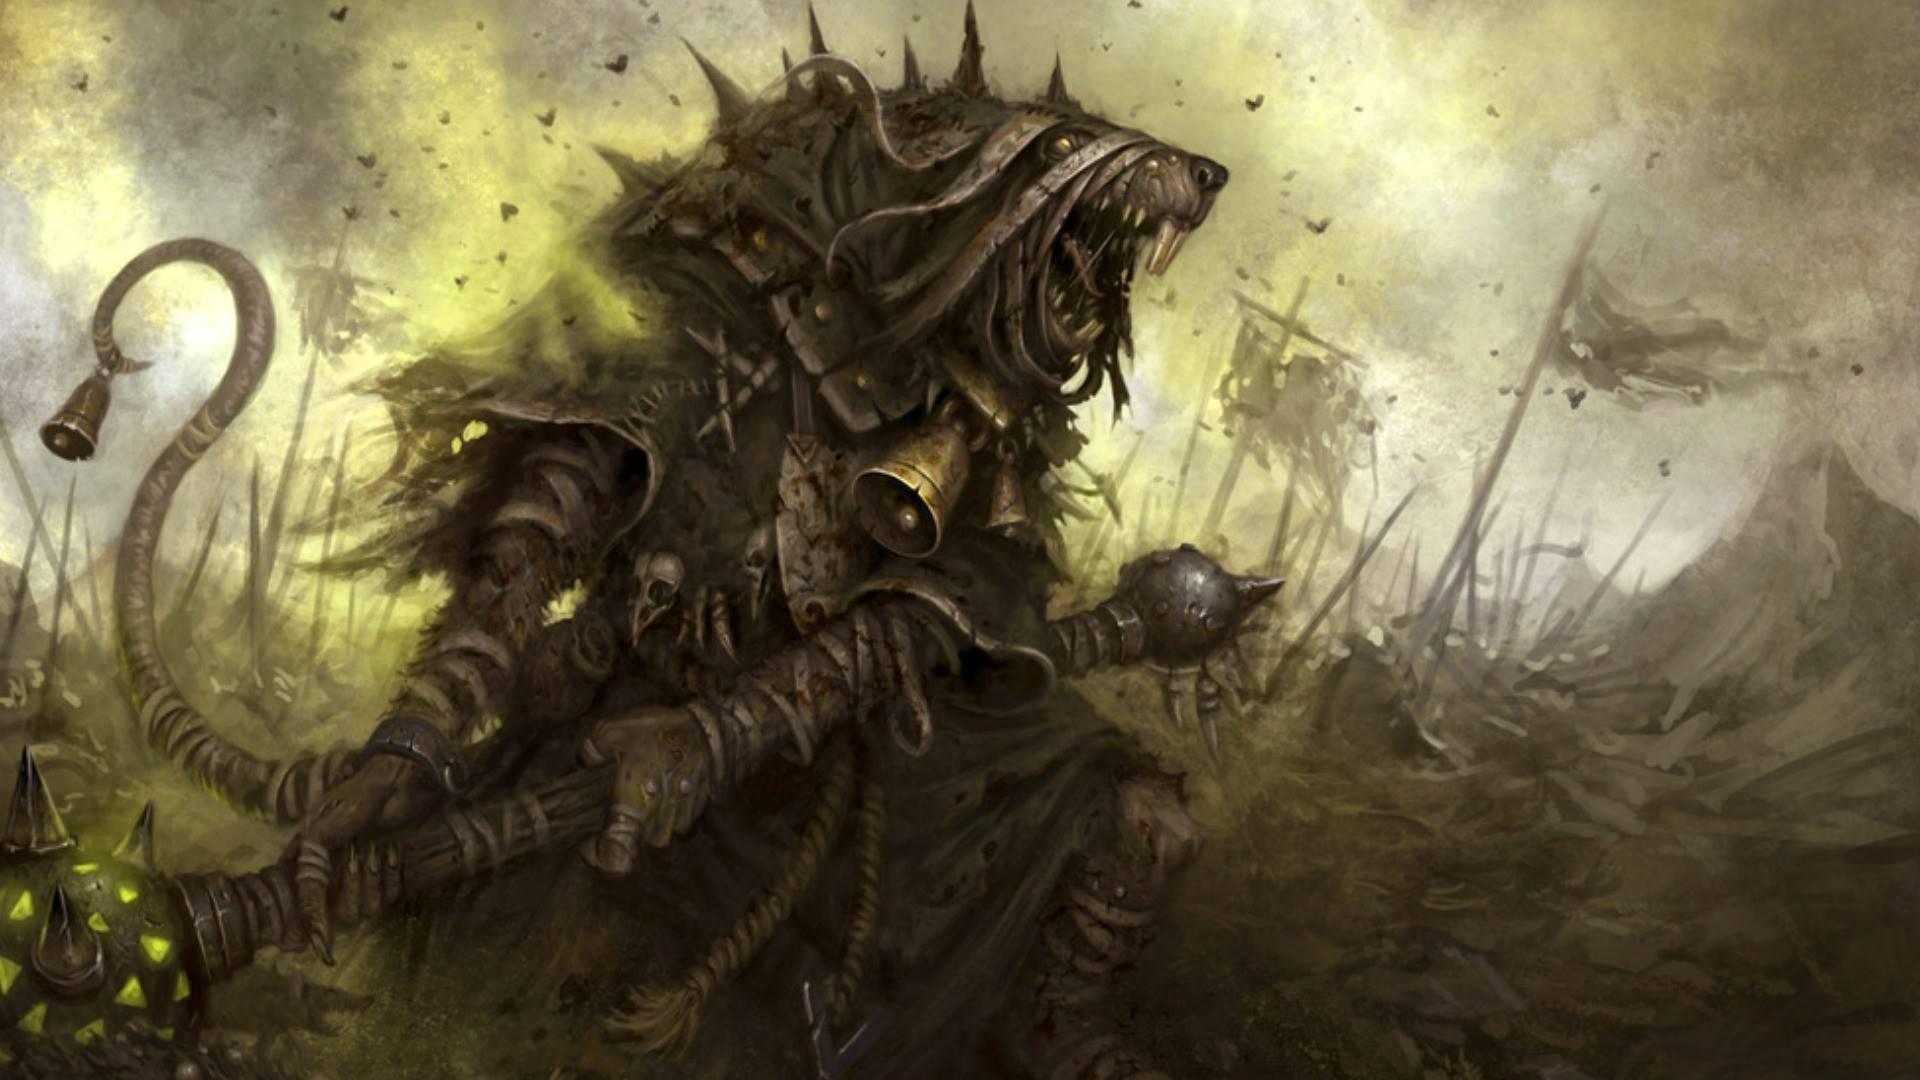 Warhammer Fantasy 19201080 Wallpaper 2368751 1920x1080